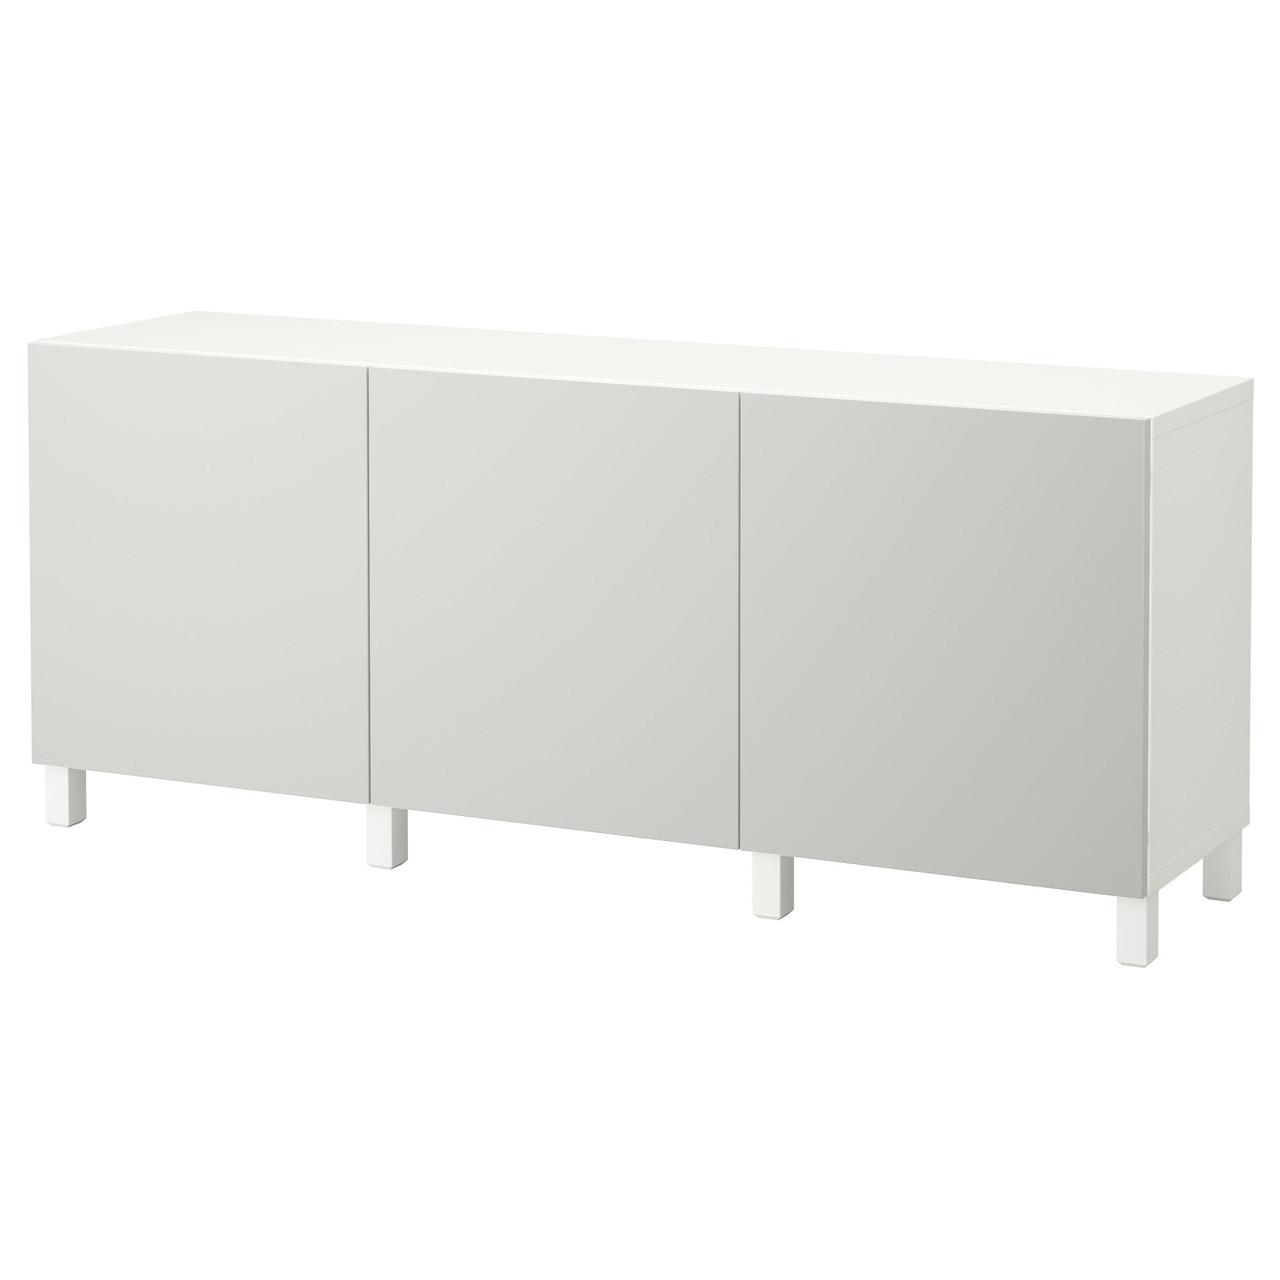 IKEA BESTA (392.059.01) Сервант/буфет